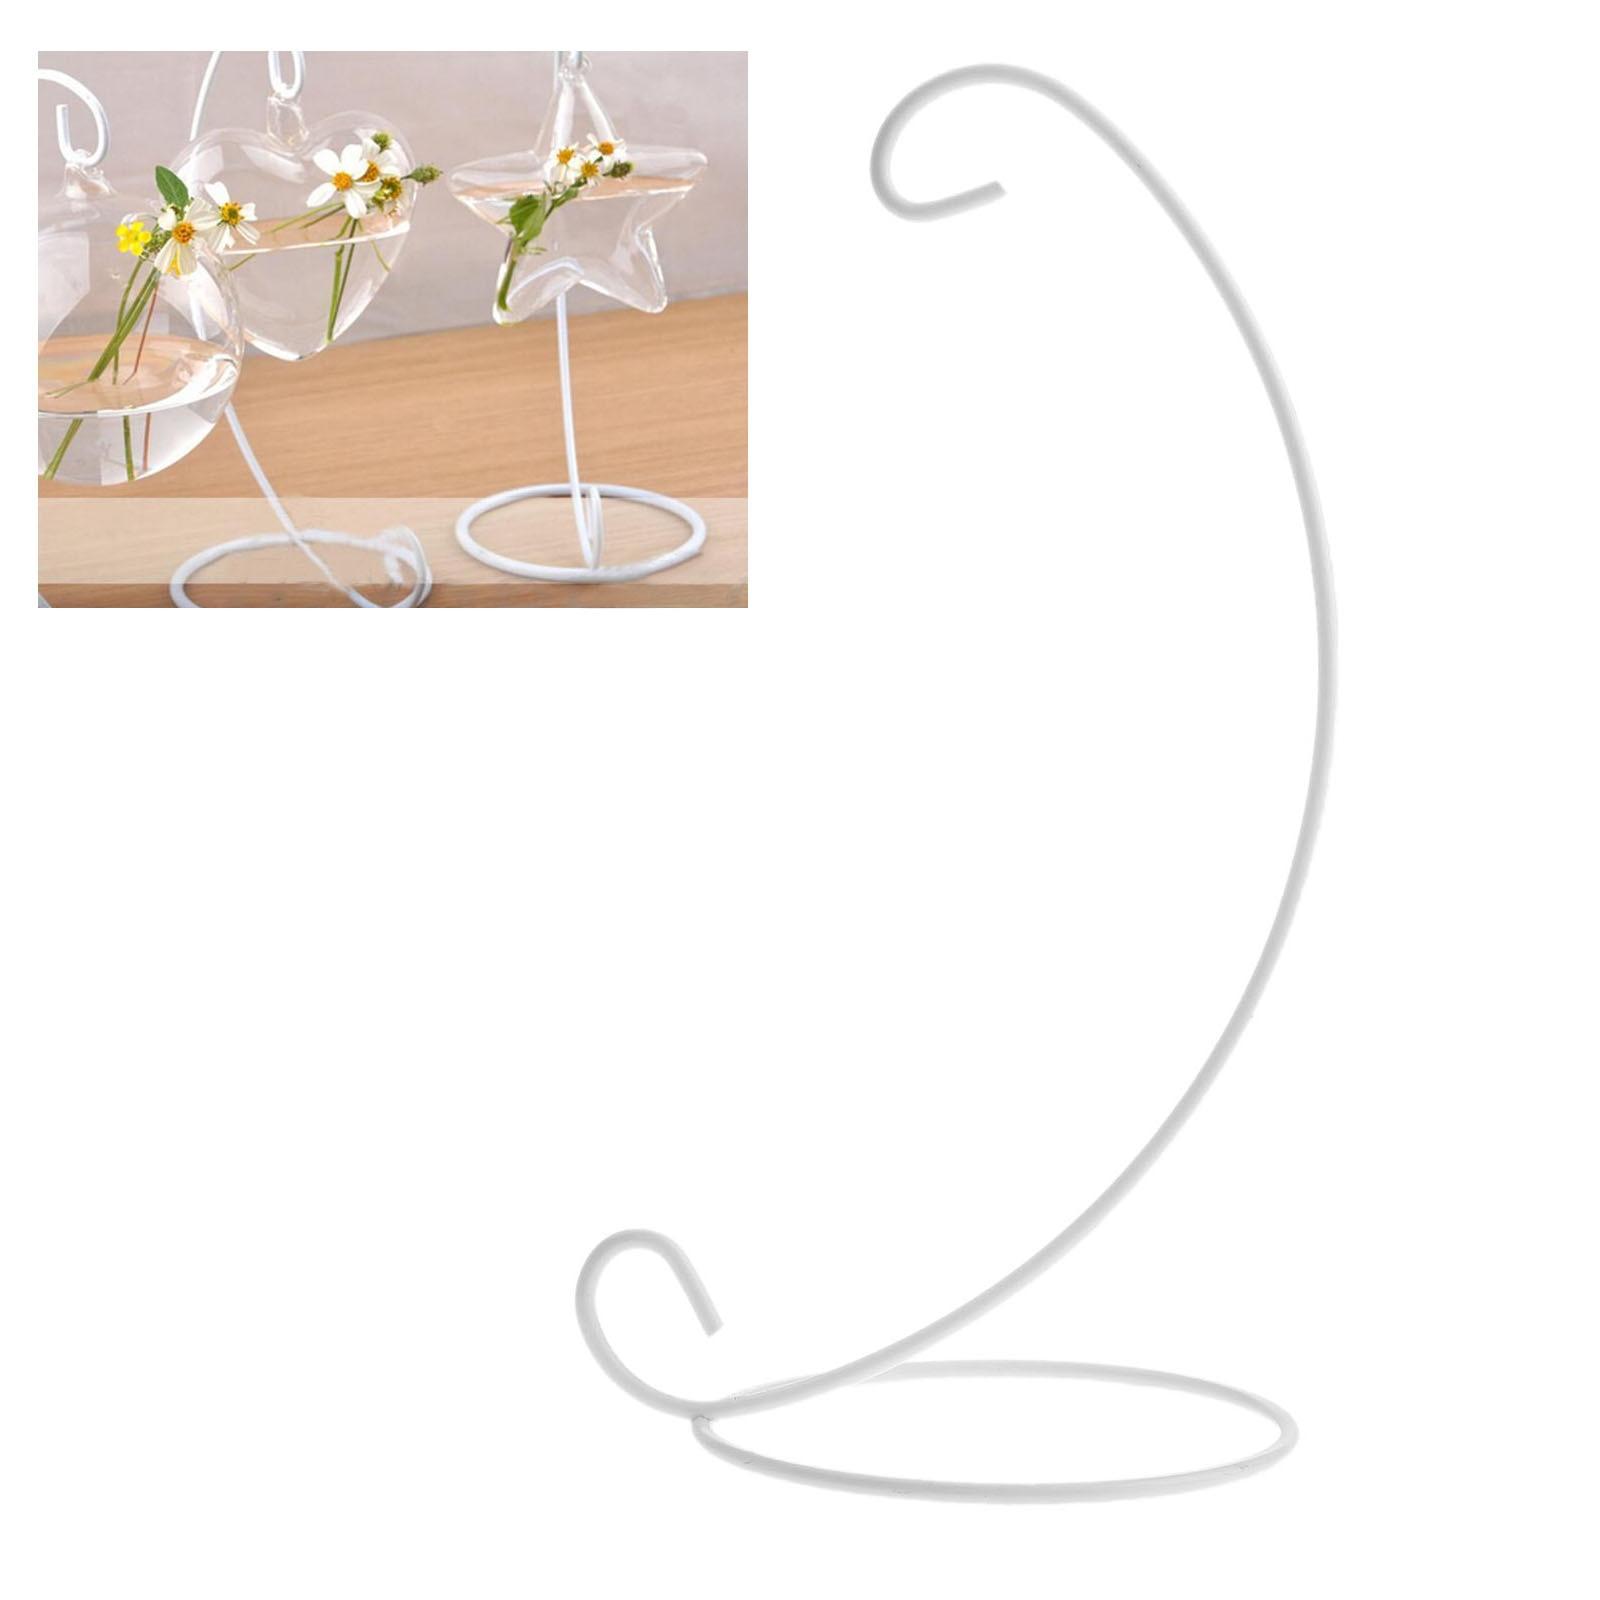 dophee 2017 1pc Κομψό σίδερο Γάμος Holder Holder - Διακόσμηση σπιτιού - Φωτογραφία 6